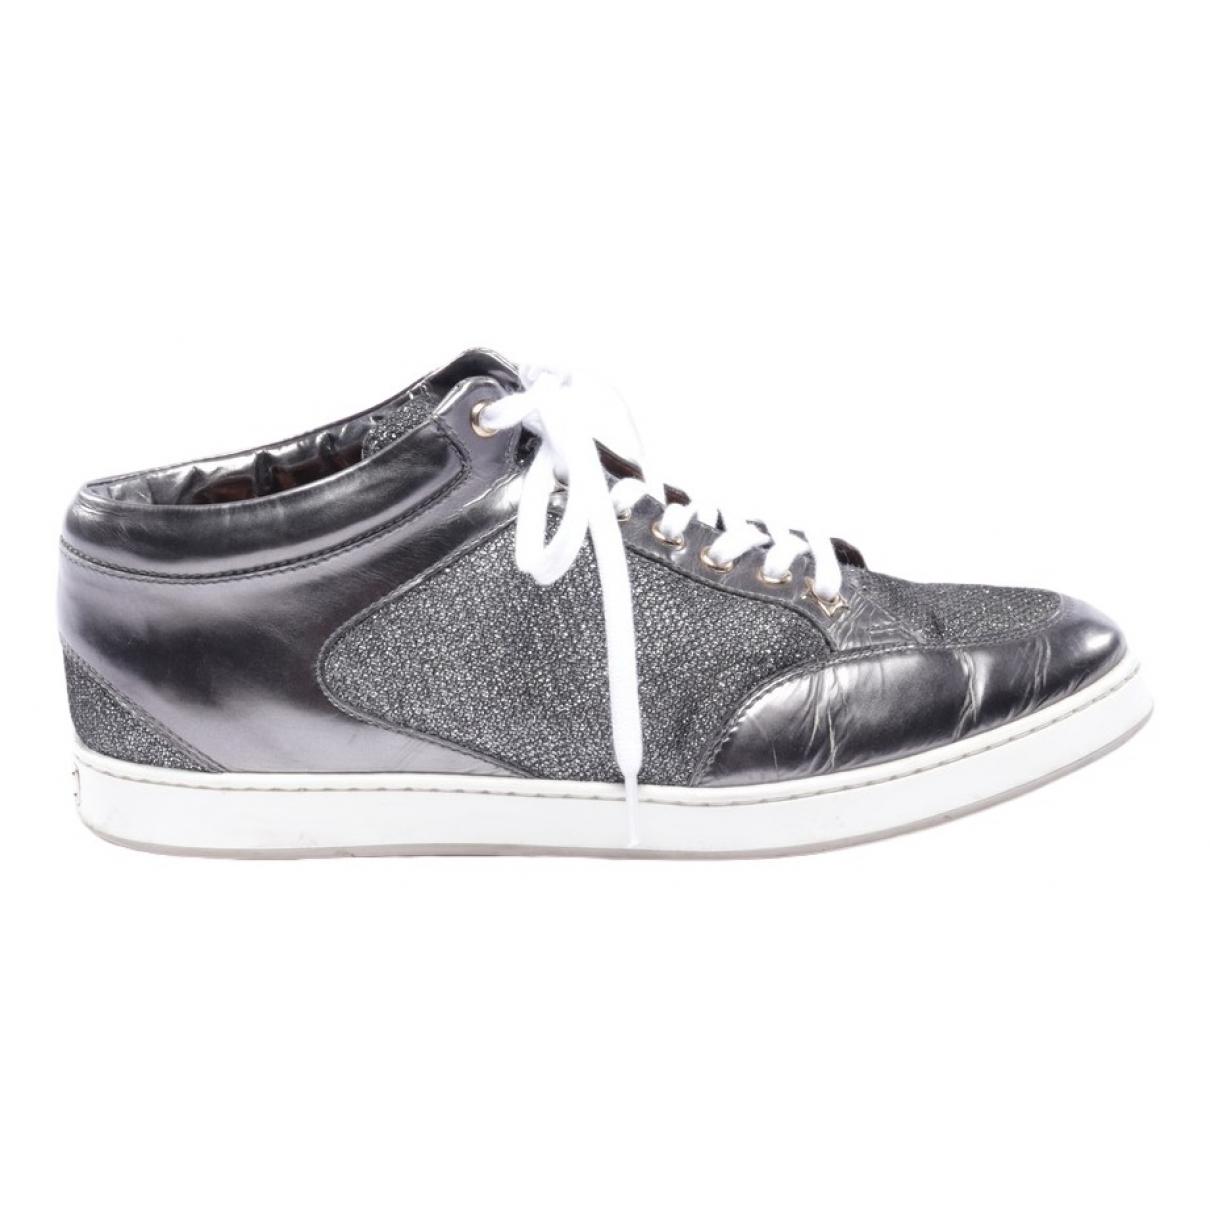 Jimmy Choo \N Grey Leather Flats for Women 38.5 EU